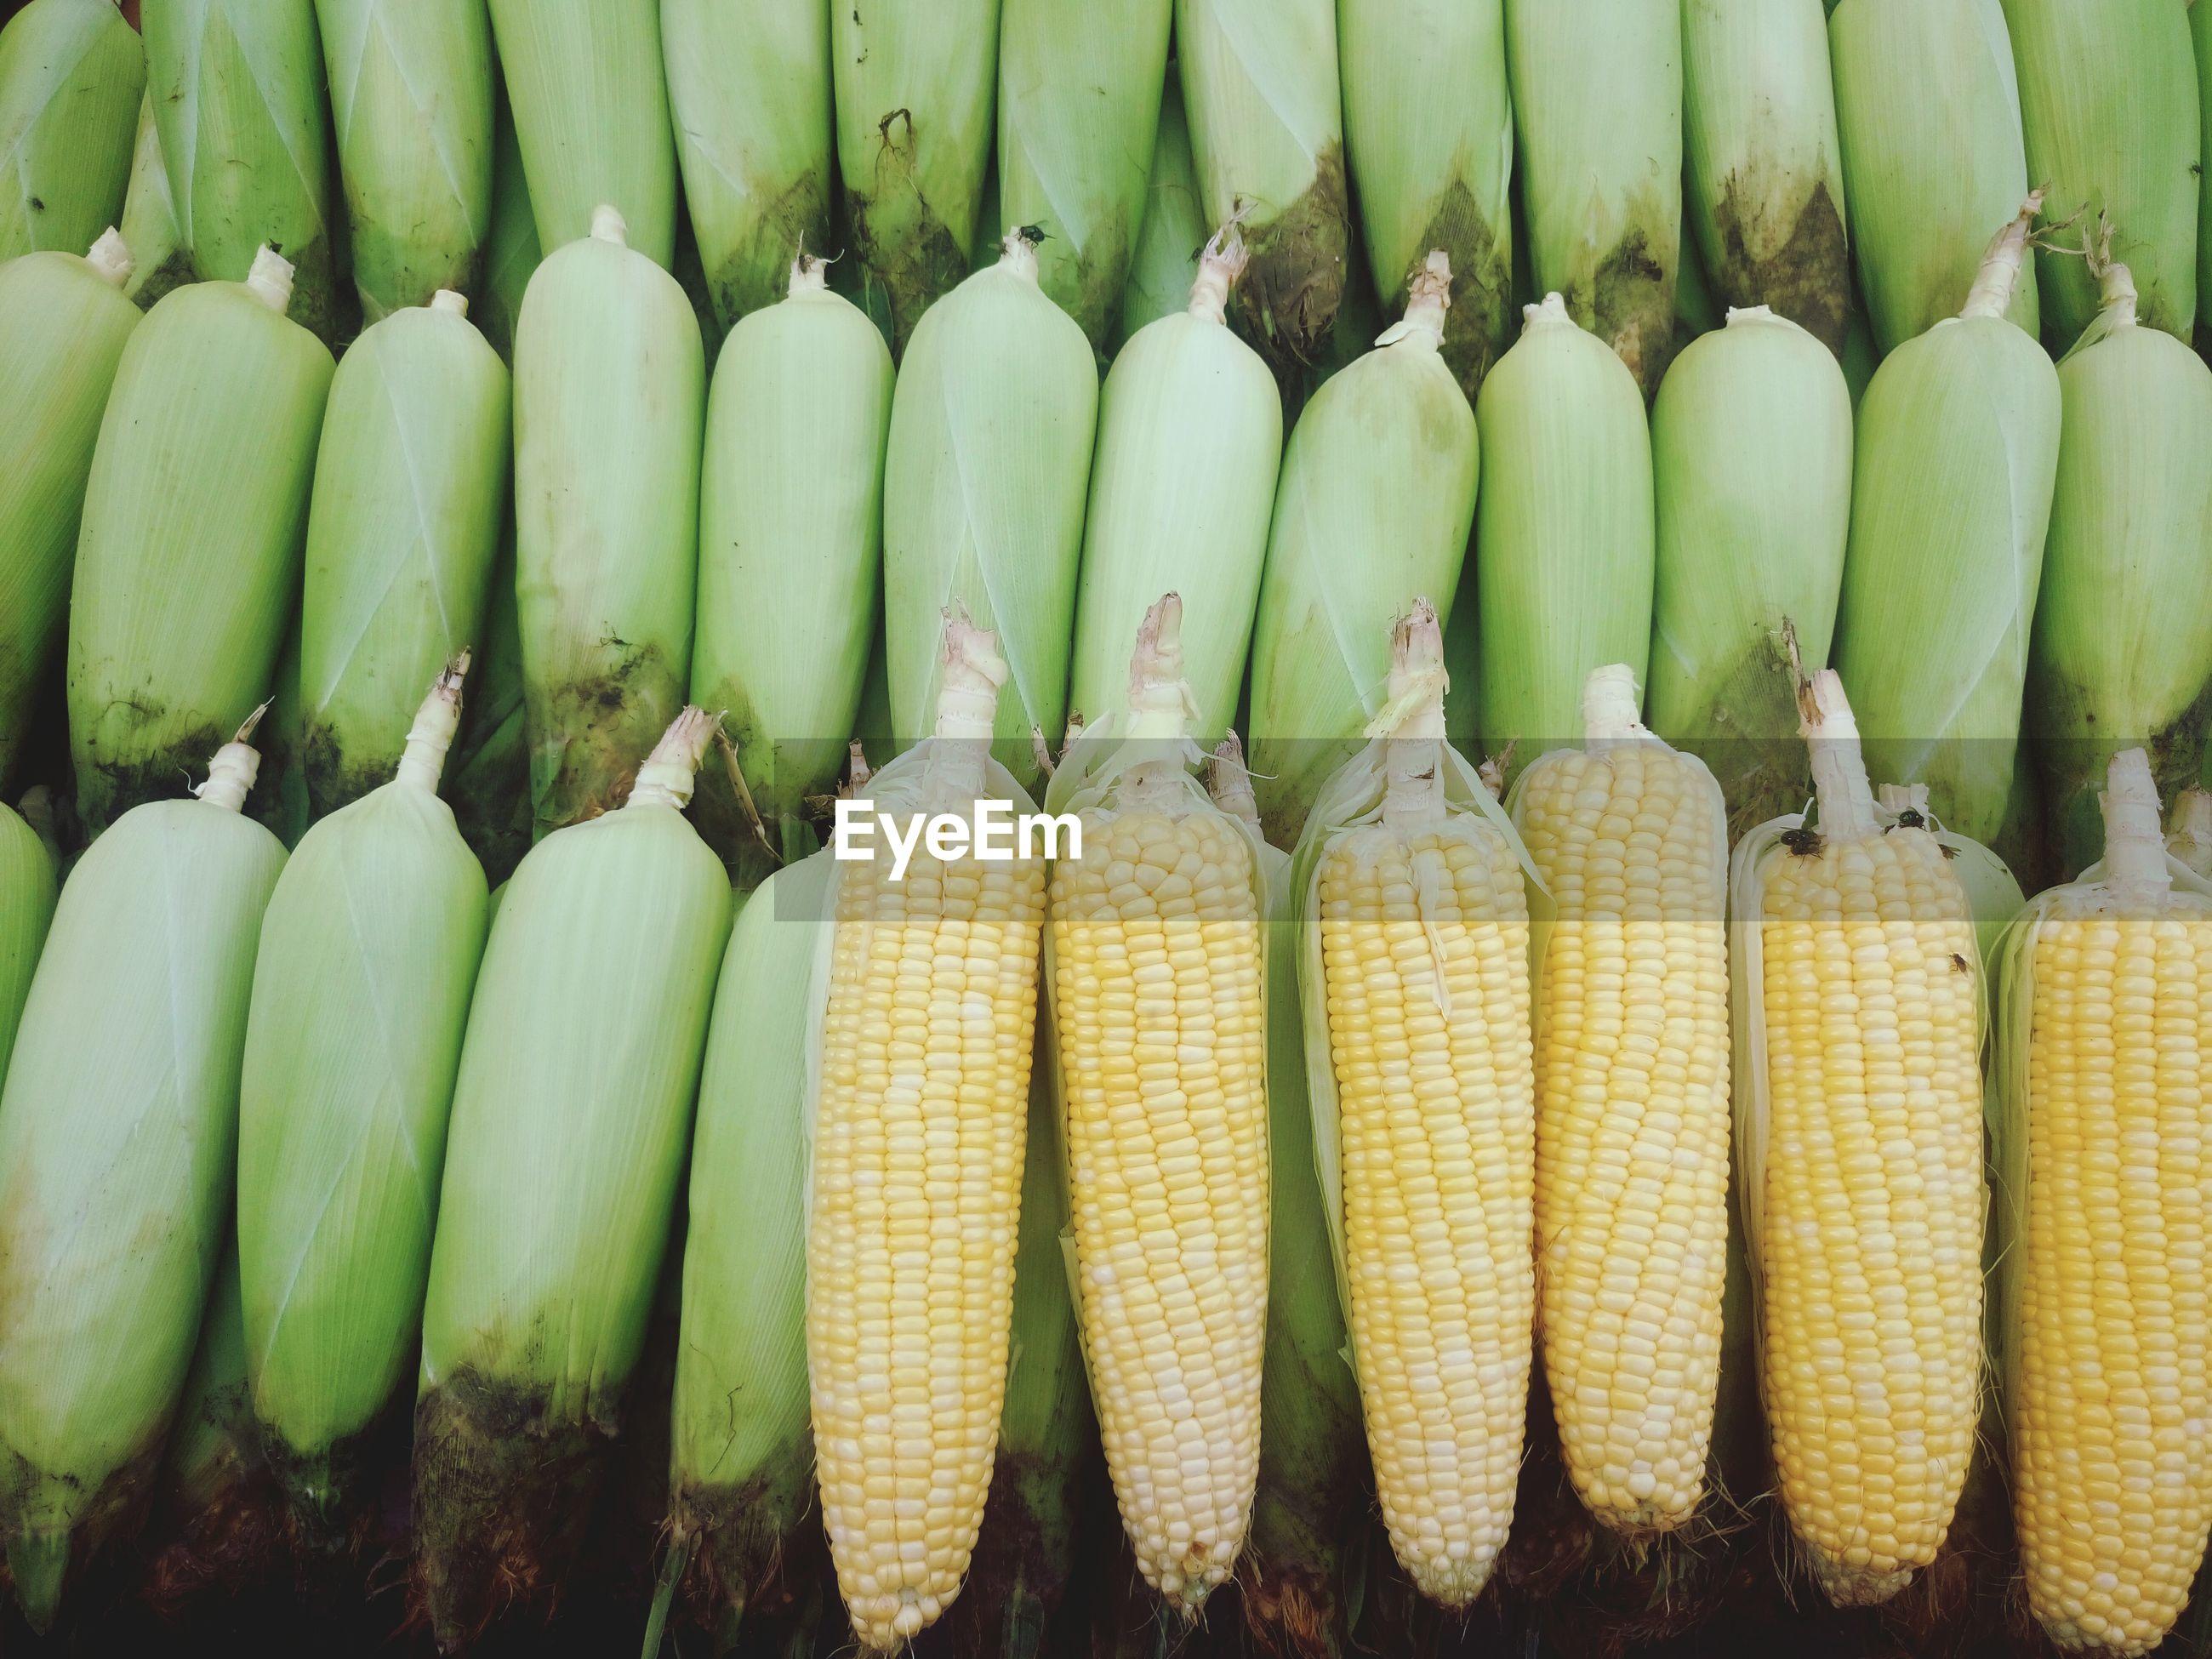 High angle view of corns at market stall